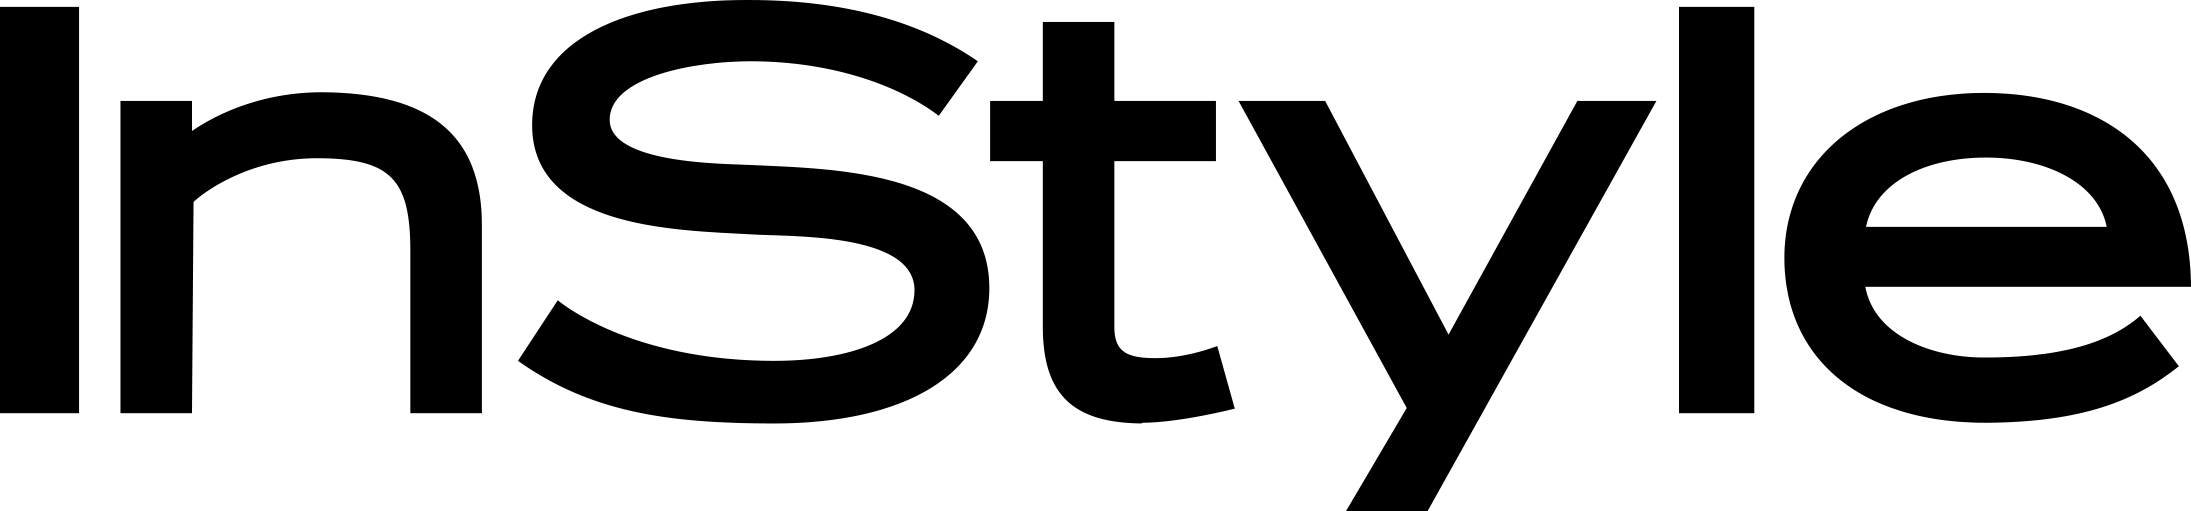 instyle-logo-black.png